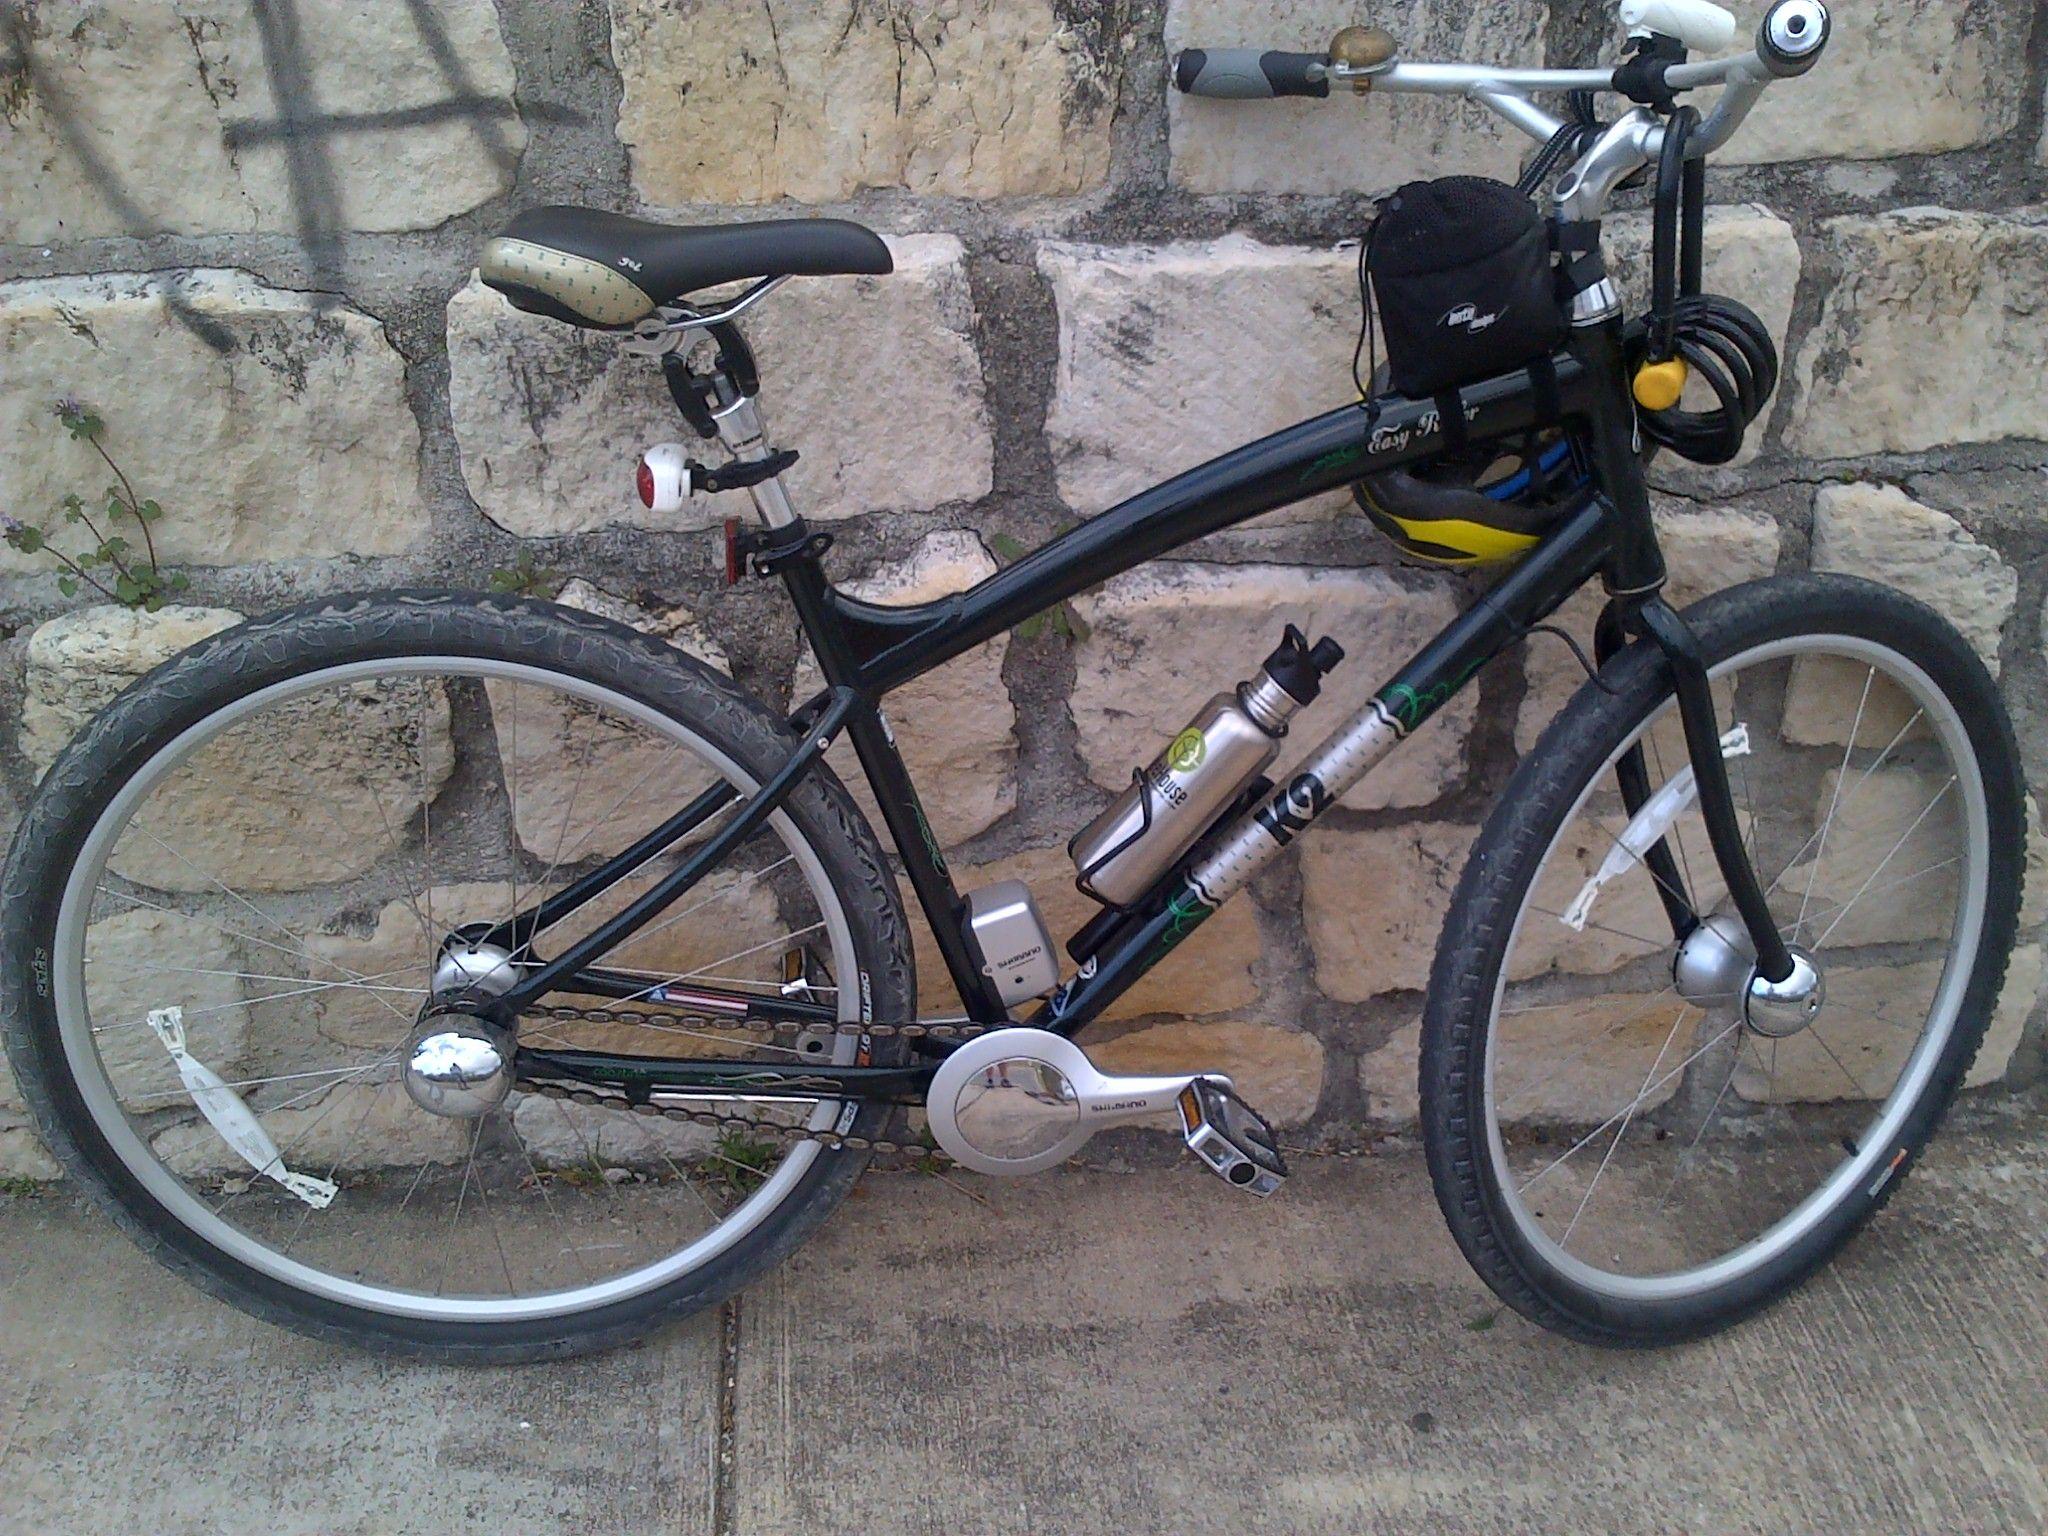 k2 easy roller coasting automatic shifting 3 speed bike. Black Bedroom Furniture Sets. Home Design Ideas